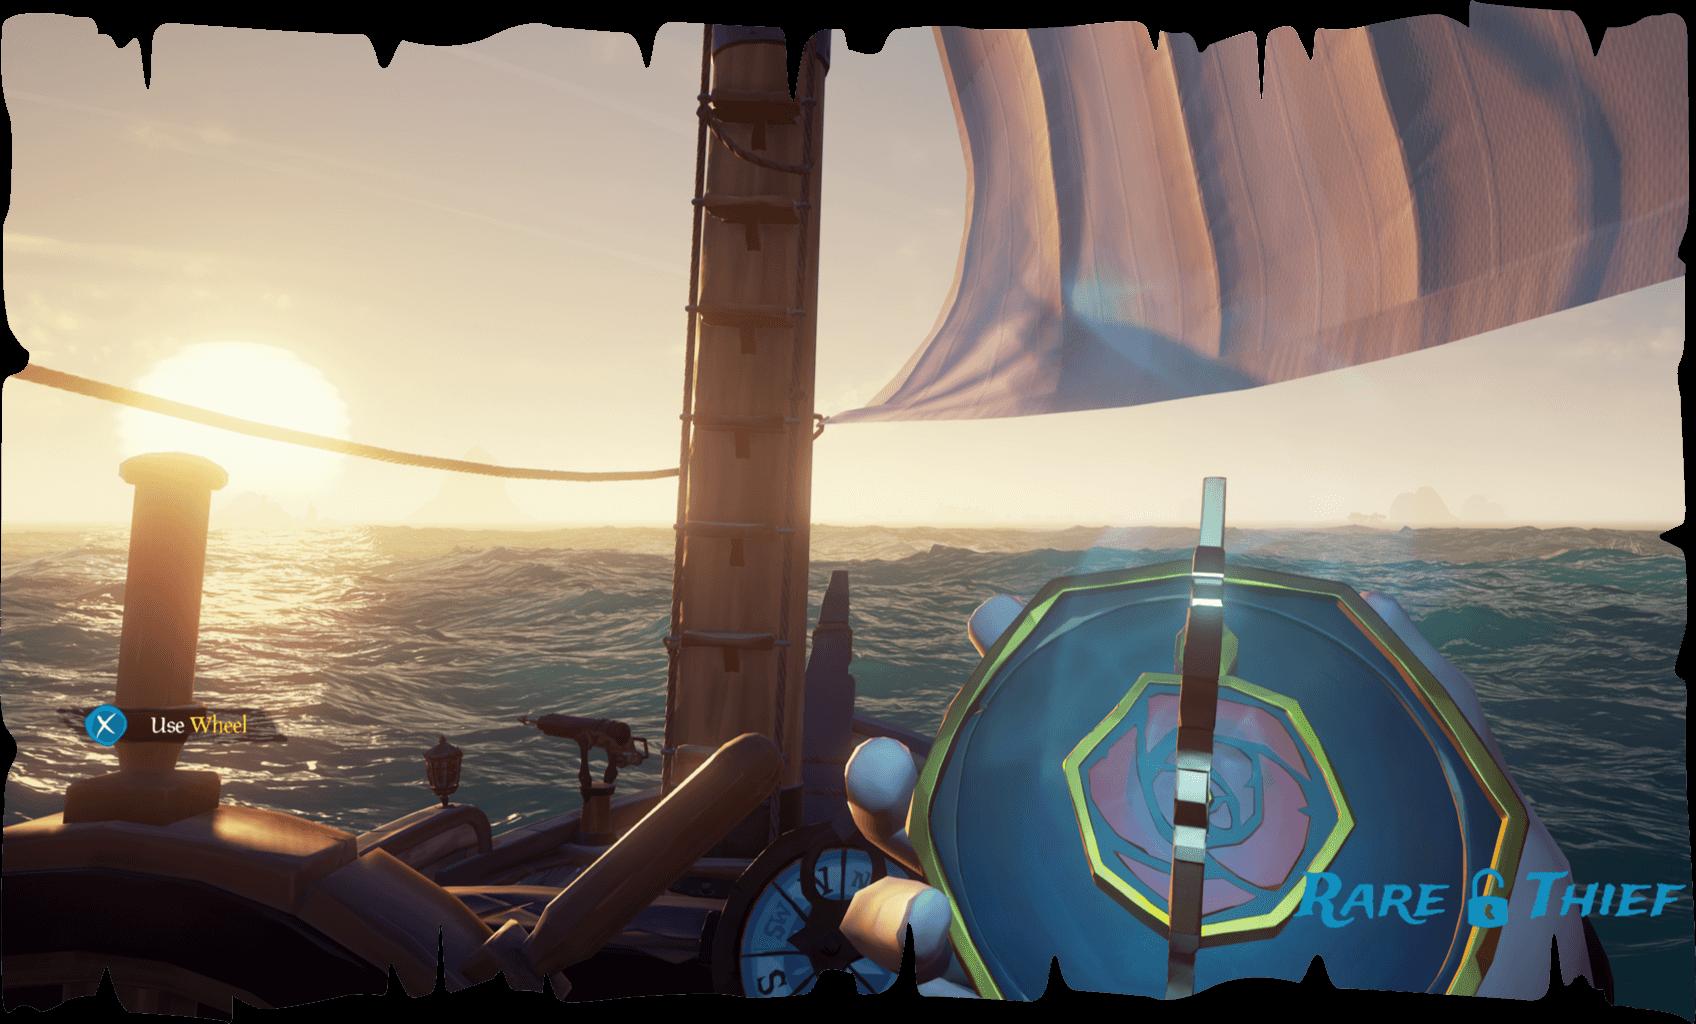 Follow Enchanted Compass